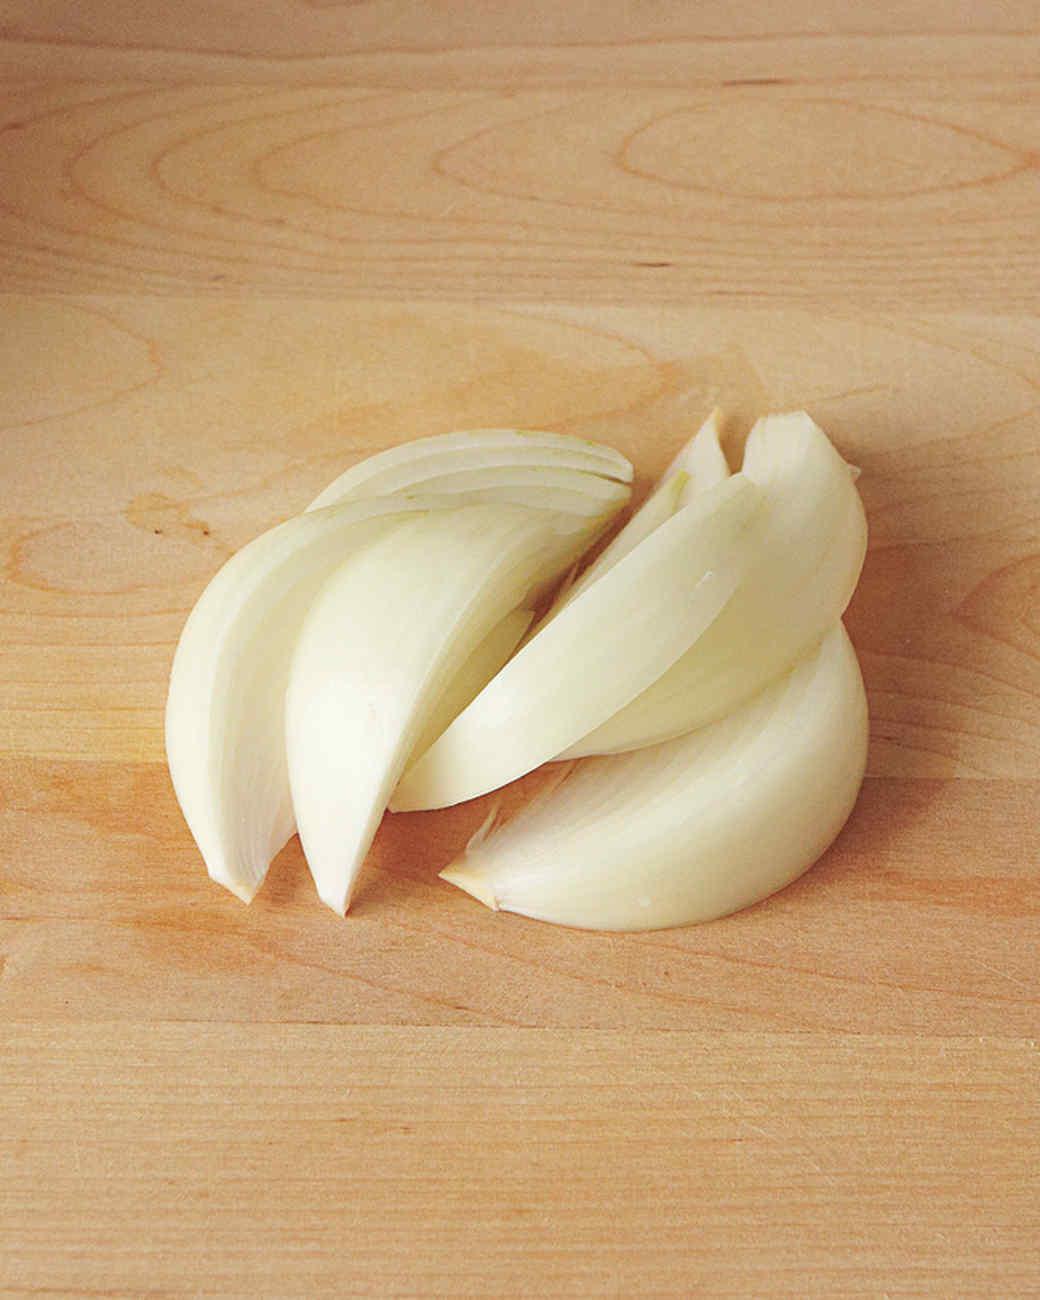 onion-wedge-2-med108359.jpg